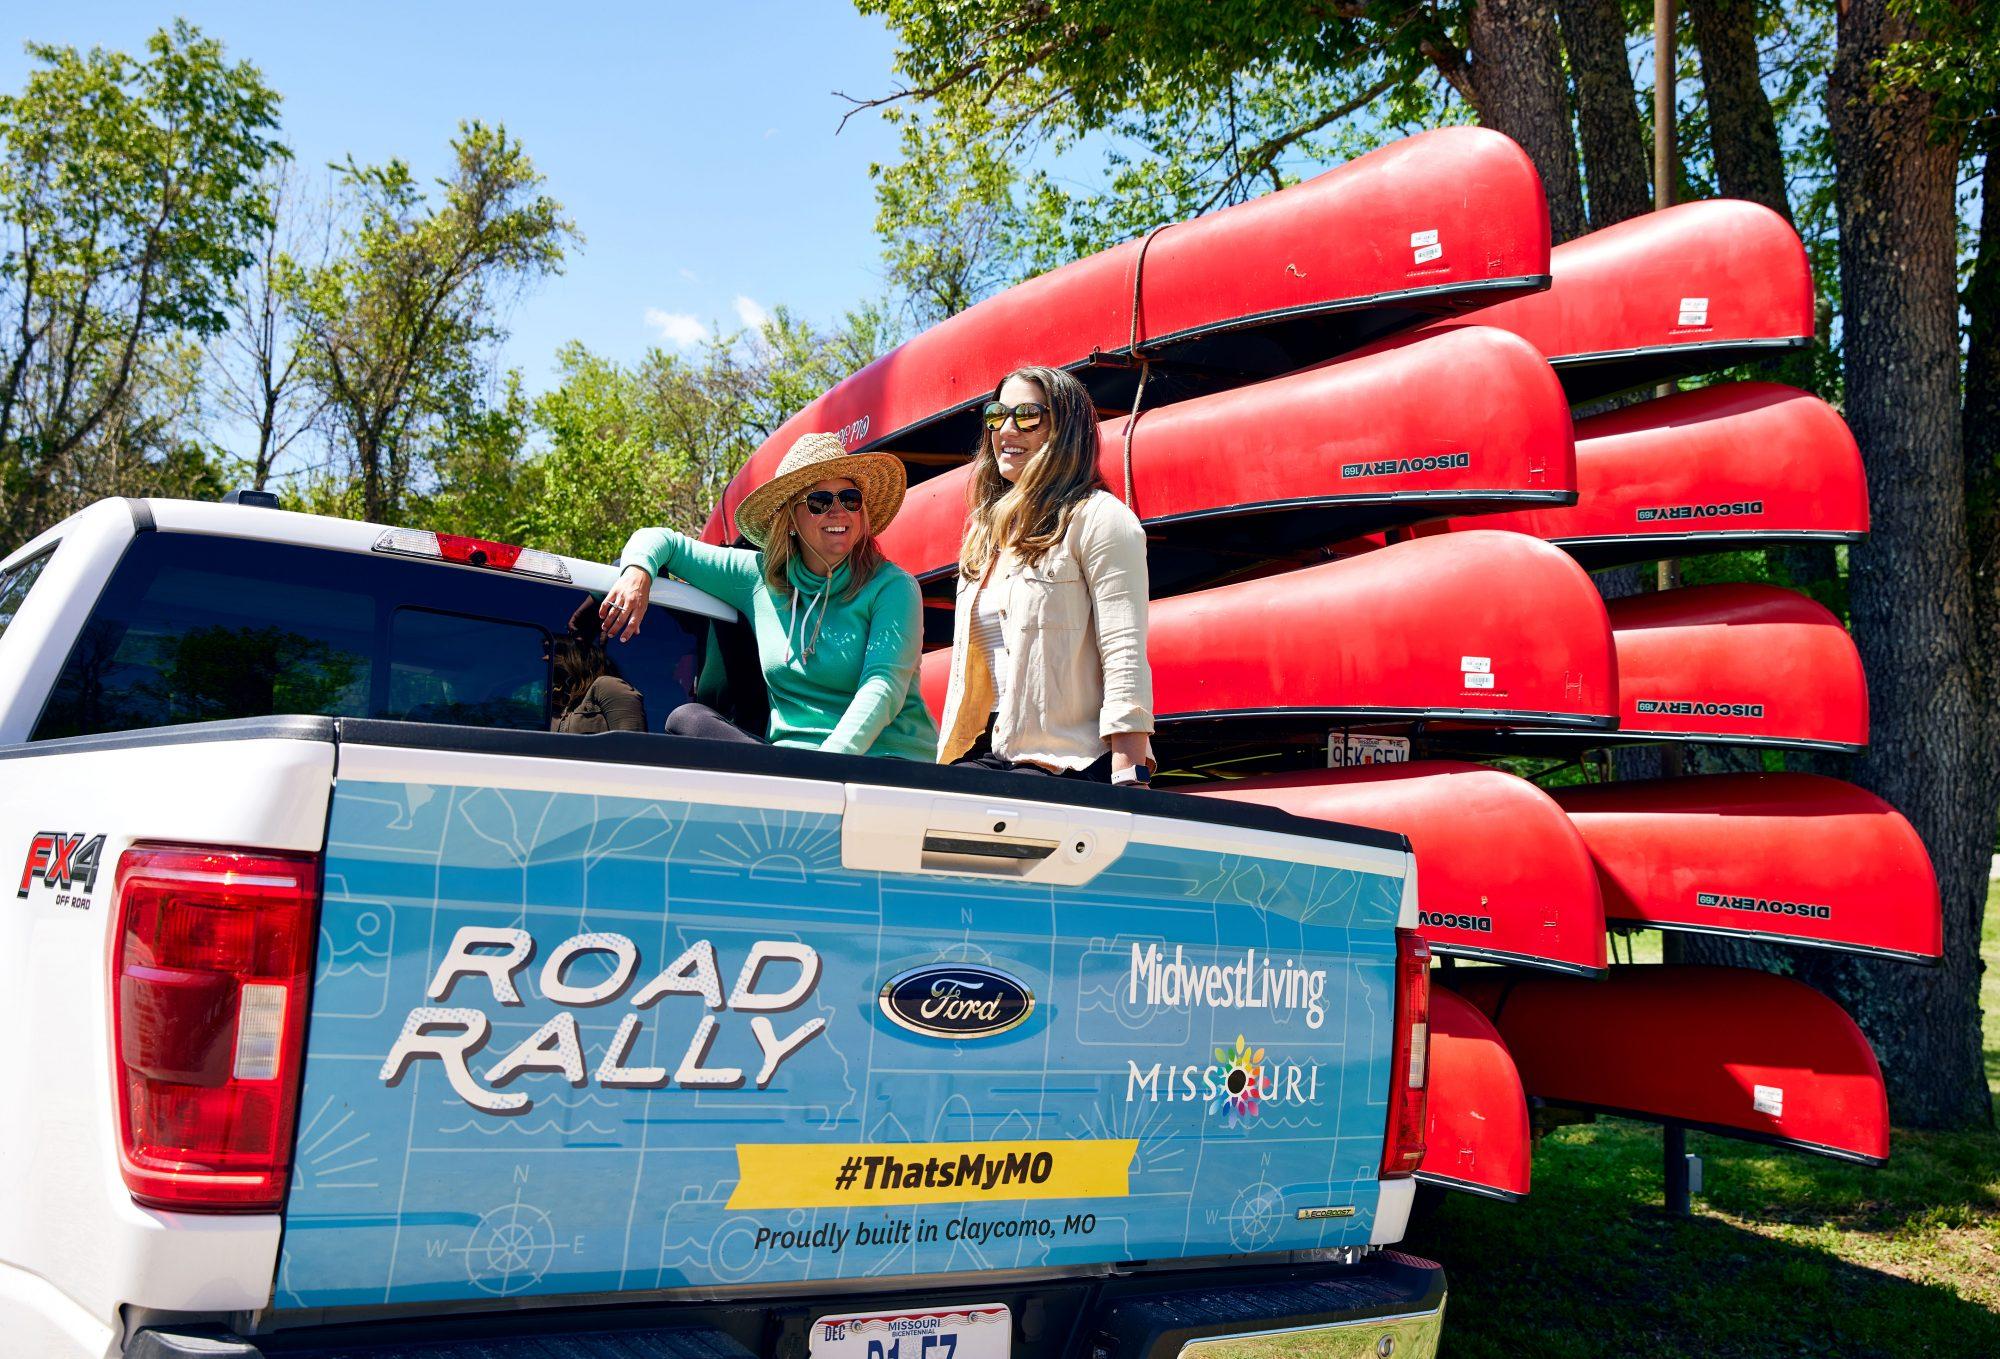 Harvey's Alley Spring Canoe Rental Missouri Road Rally 2021